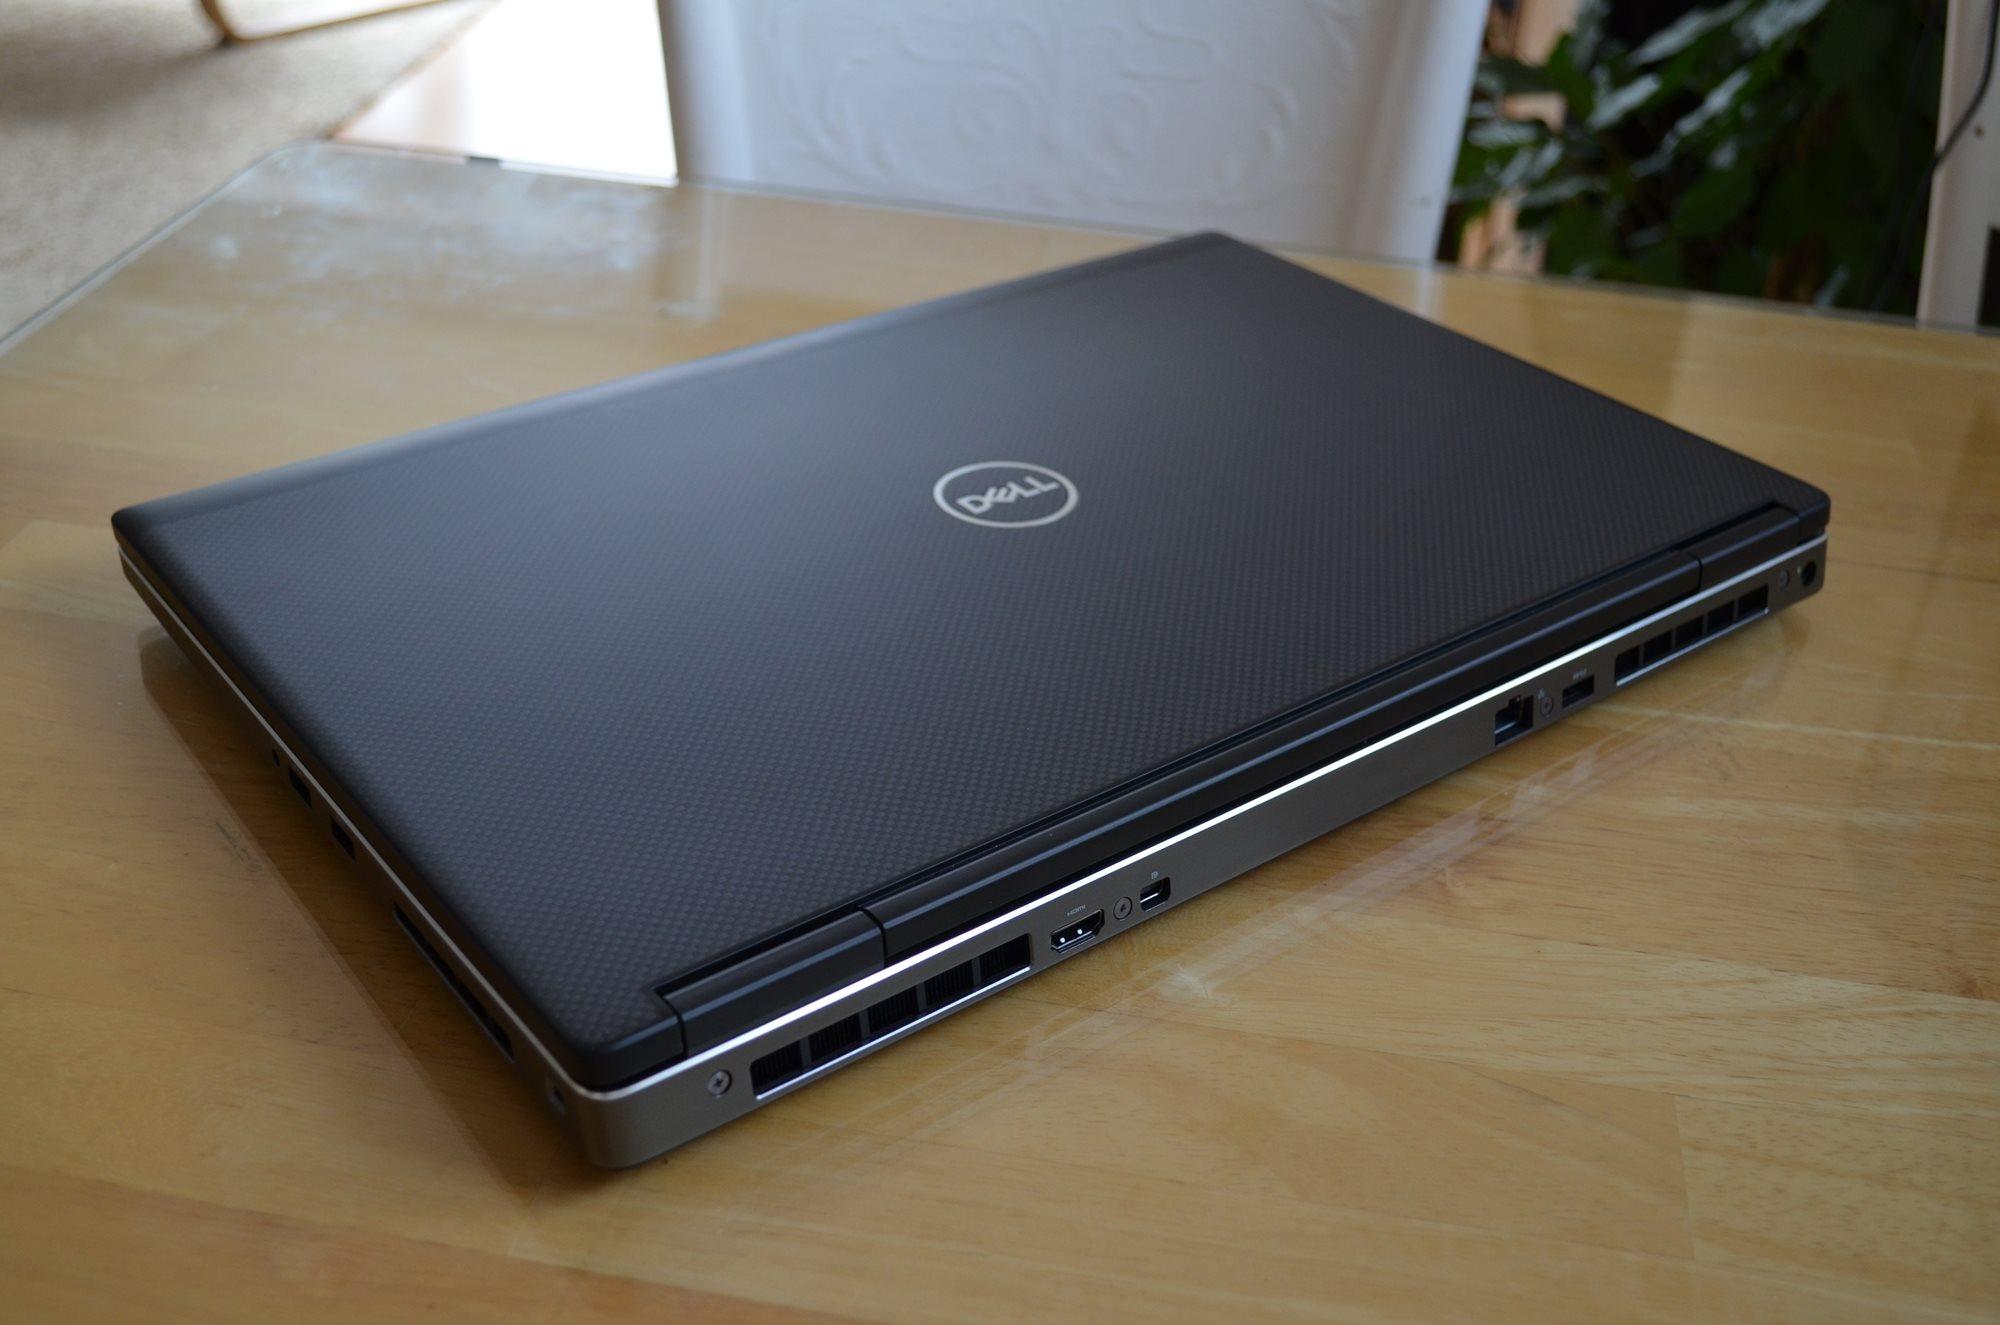 Dell Precision 7730 – pohled zezadu shora